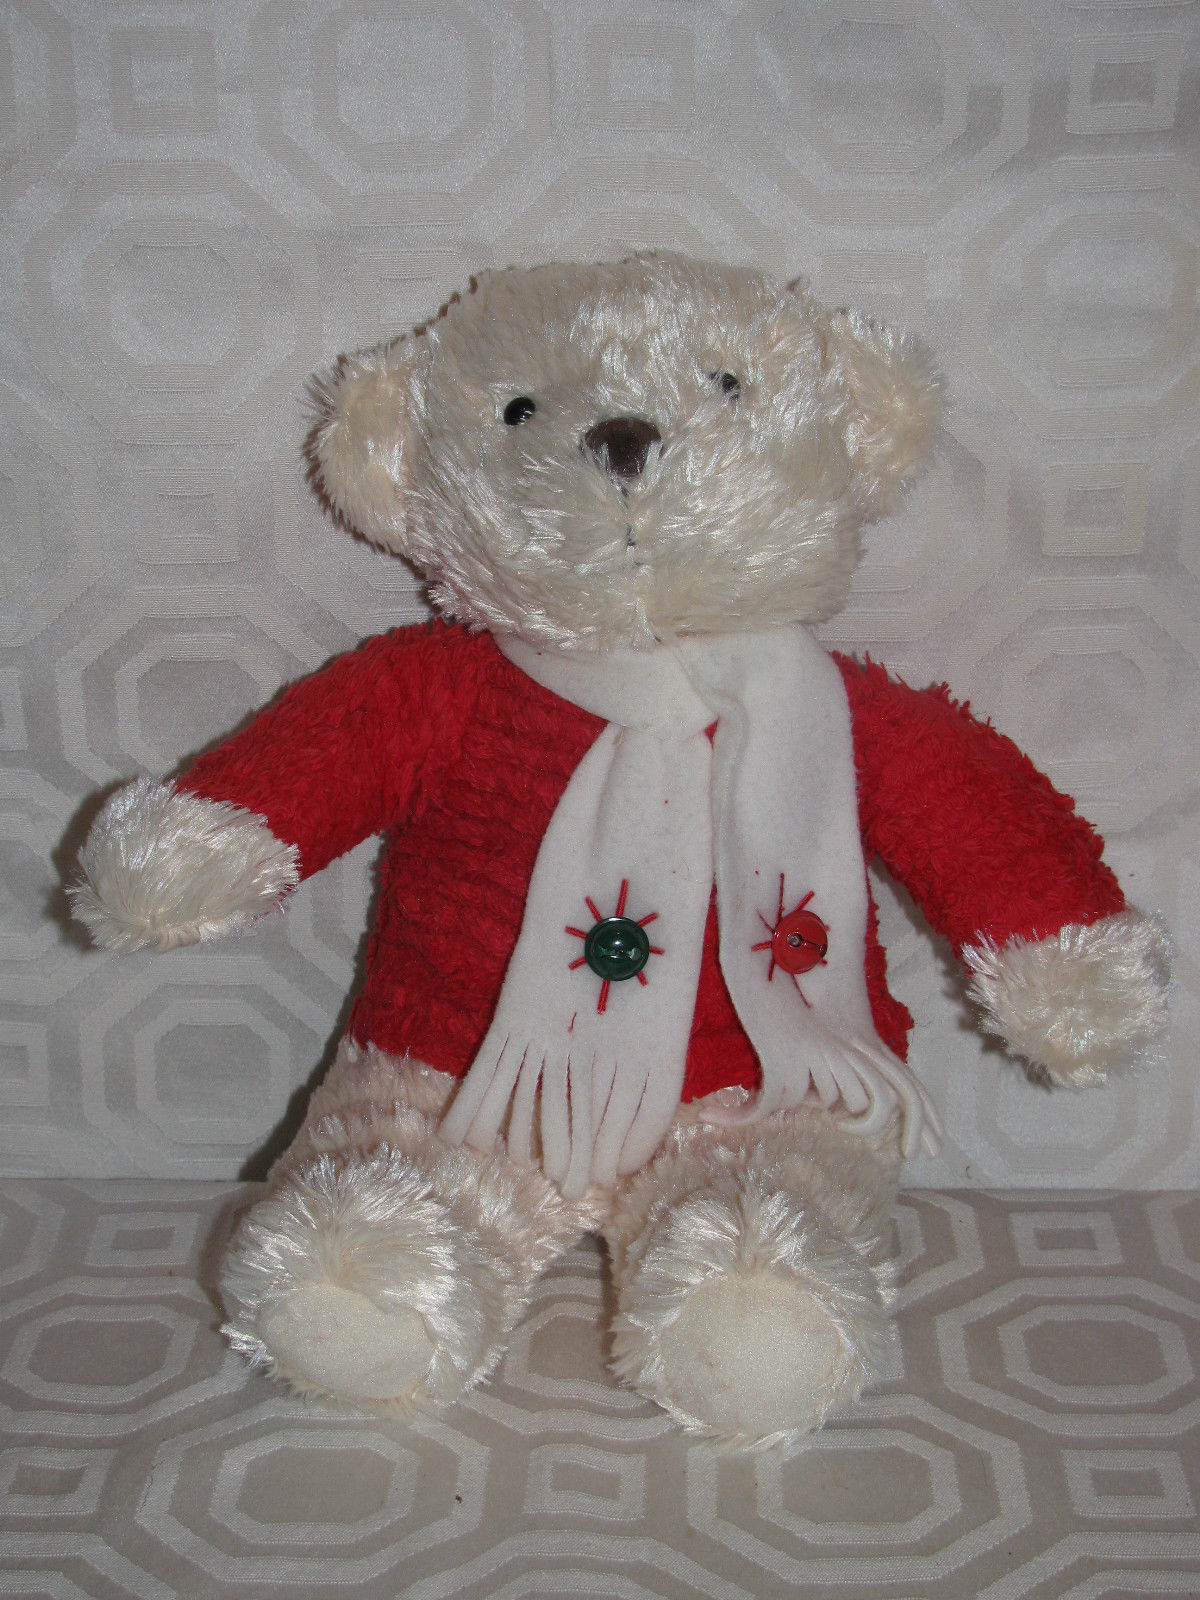 Christmas Vtg Hallmark Plays Jingle Bells Bears Red Top Green & Red Bells Scarf